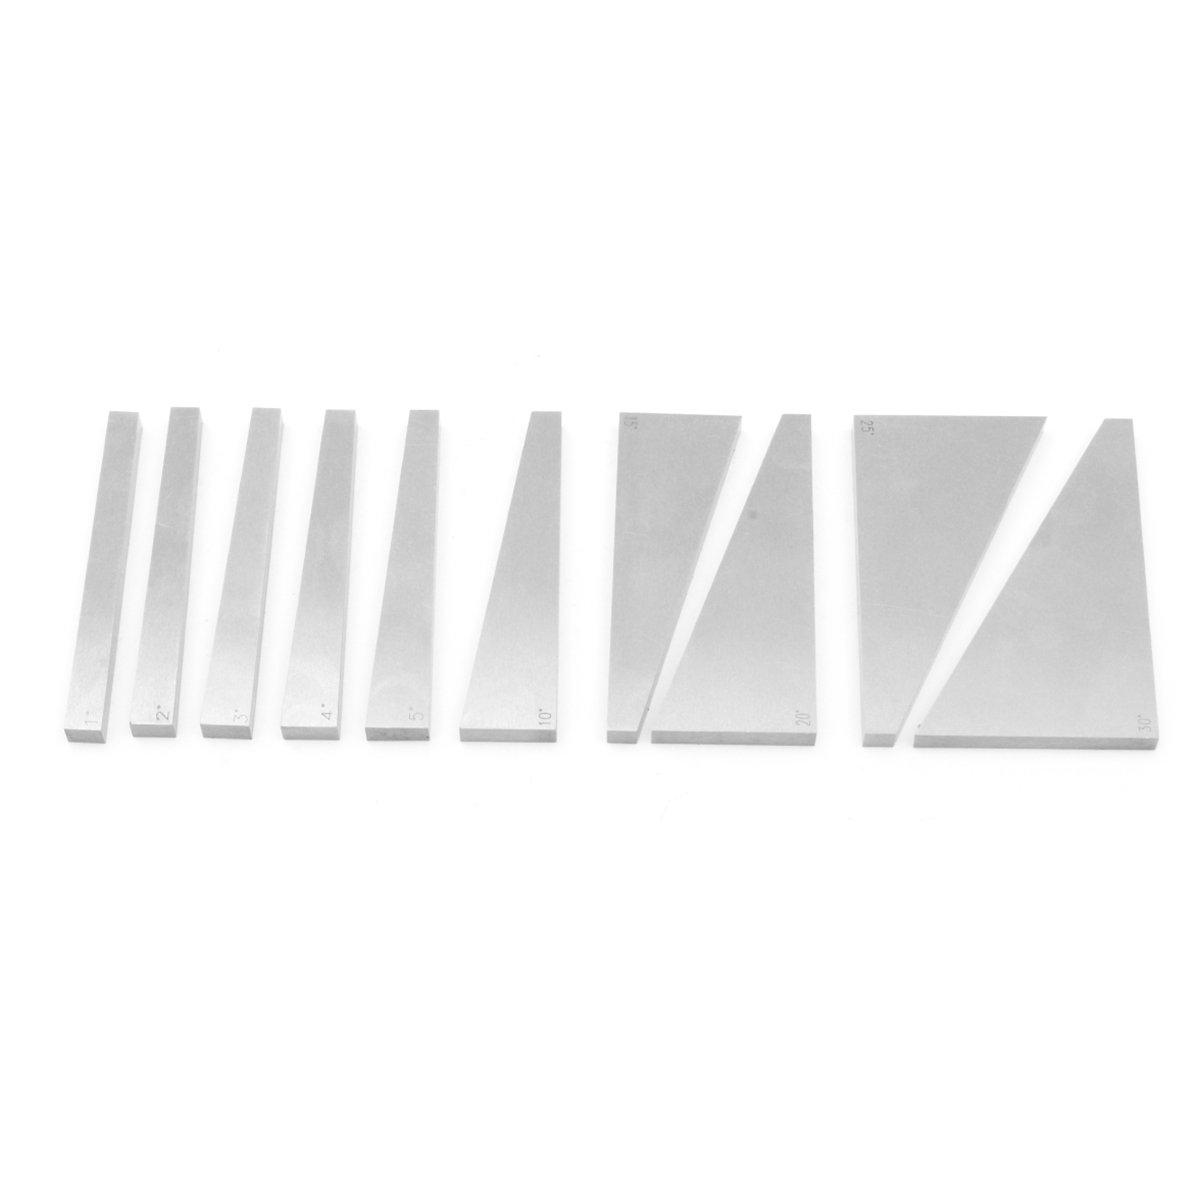 10Pcs Precision Angle Blocks Set Lathes Milling Machinist Ground 1°/ 2°/ 3°/ 4°/ 5°/ 10°/ 15°/ 20°/ 25°/ 30°